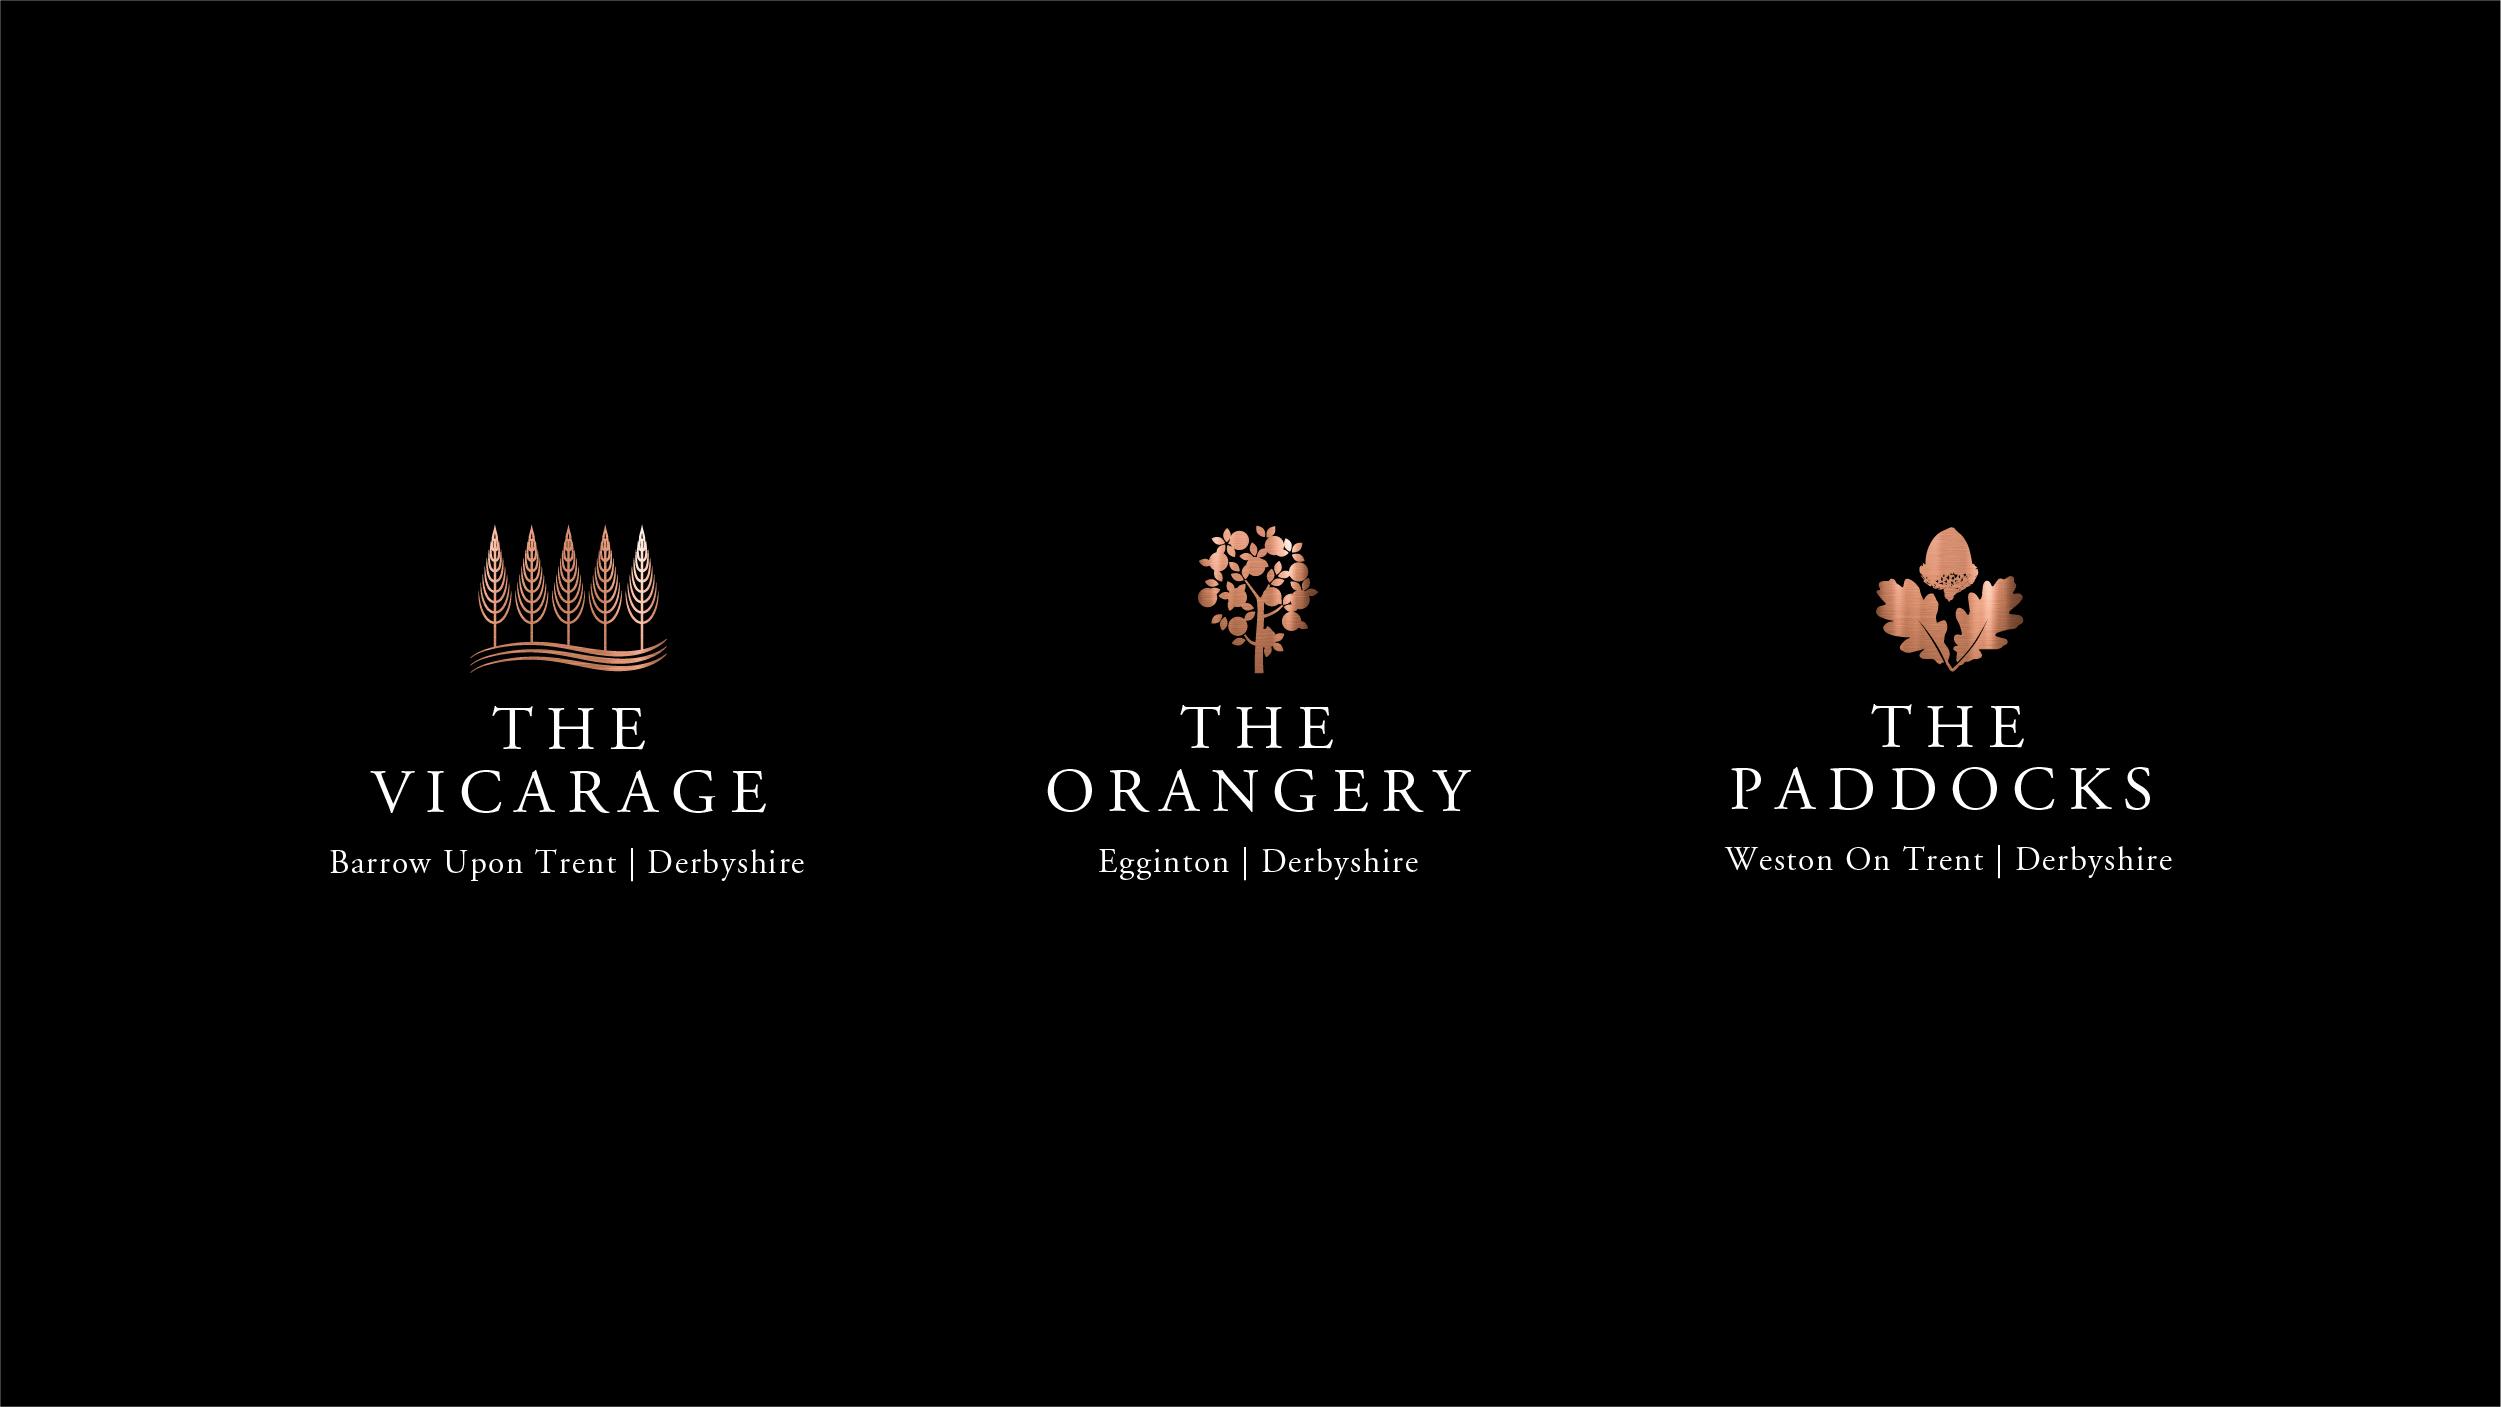 The Vicarage The Orangery The Paddocks logos